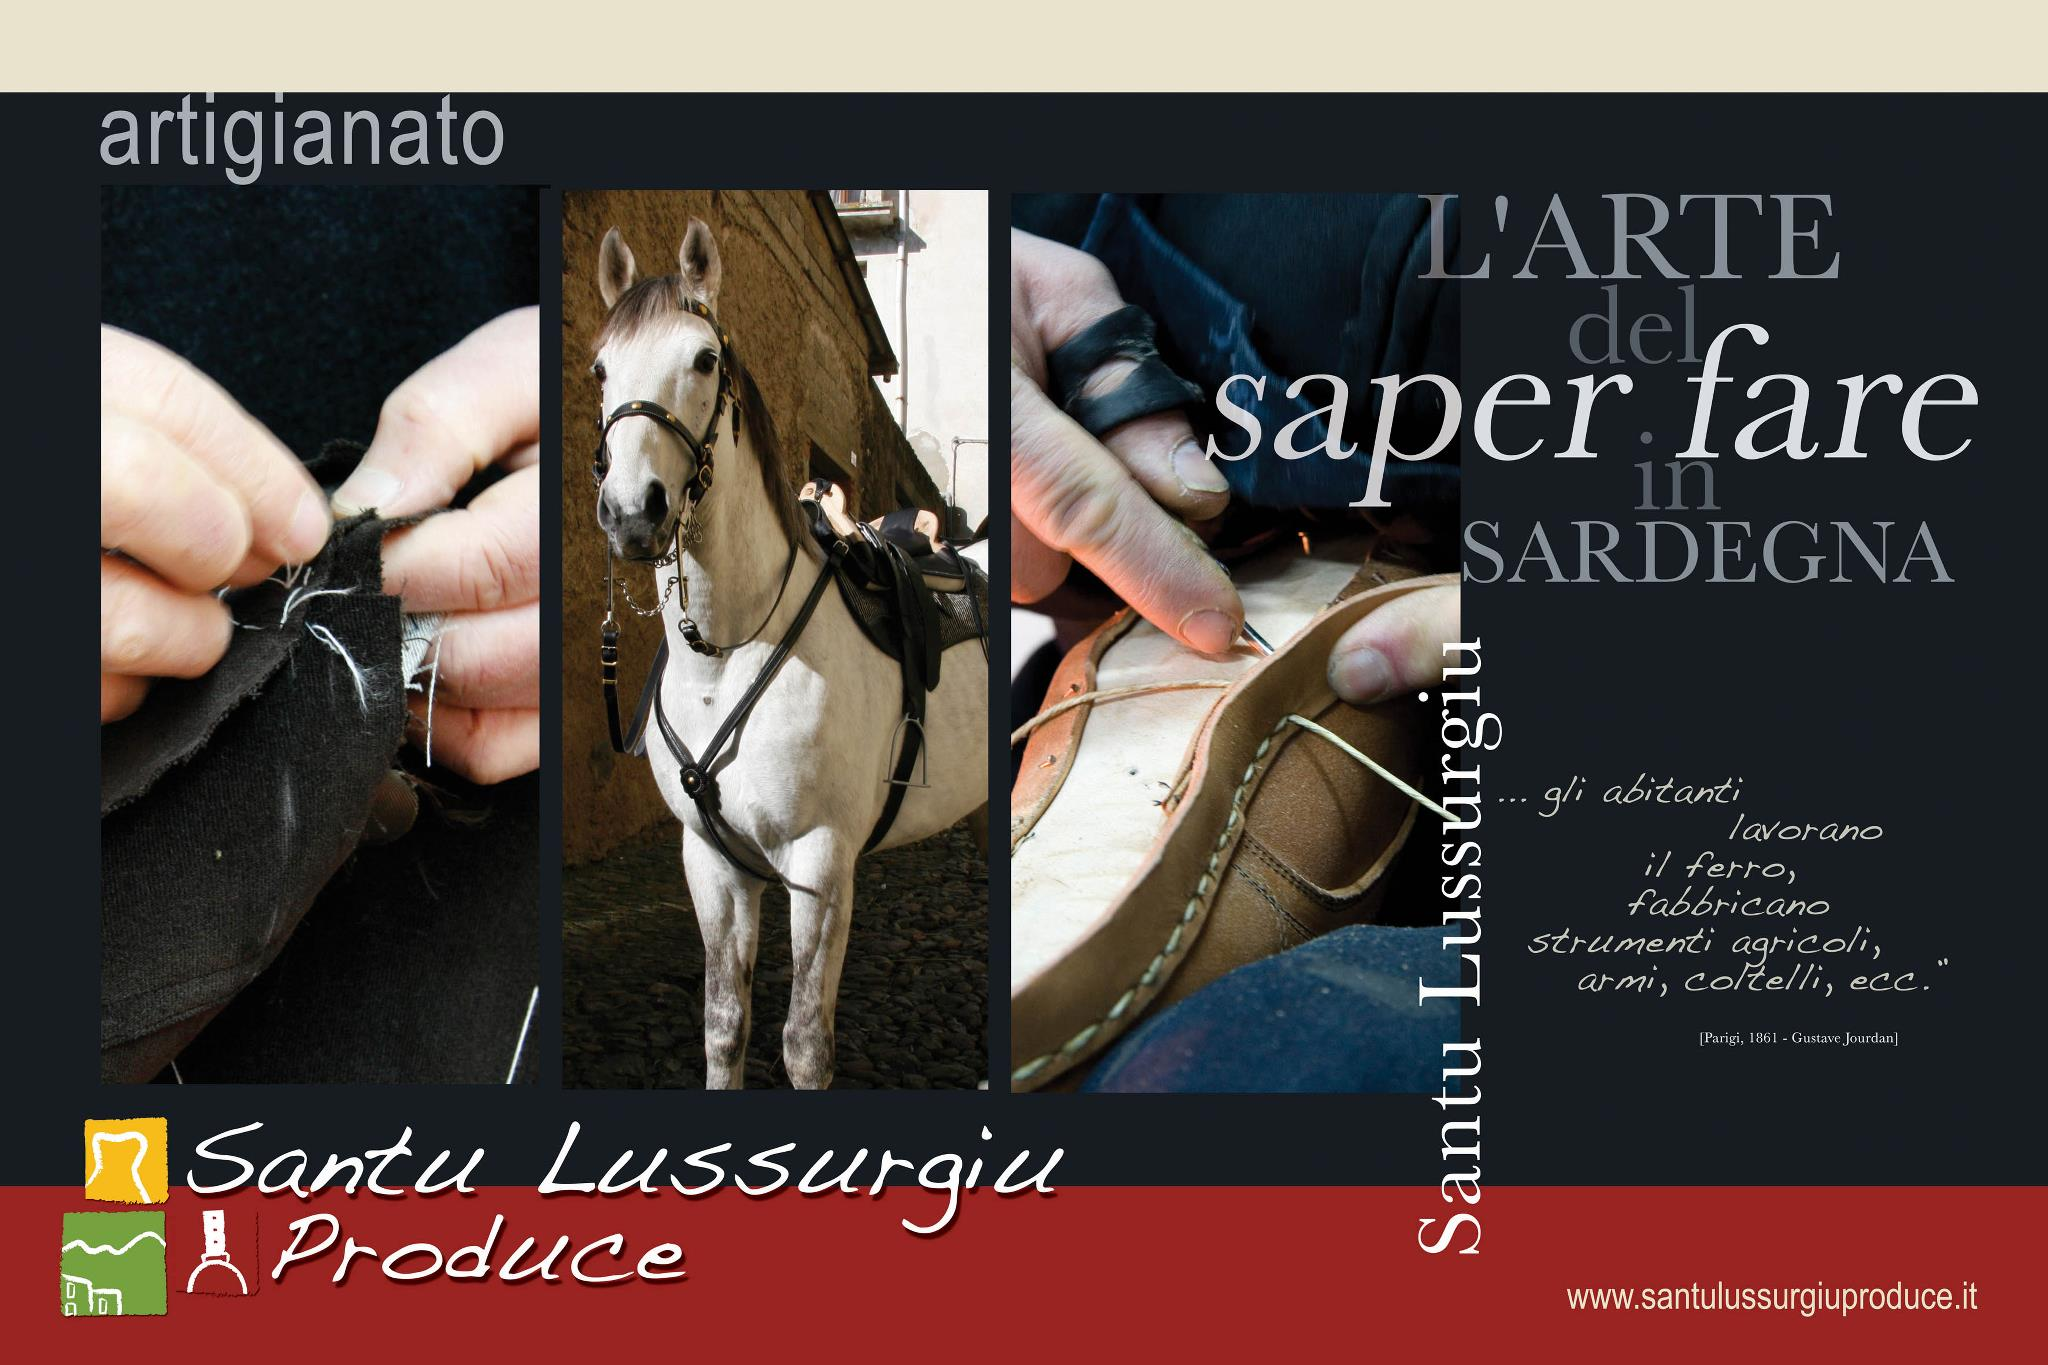 Santu Lussurgiu produce_locandina artigianato